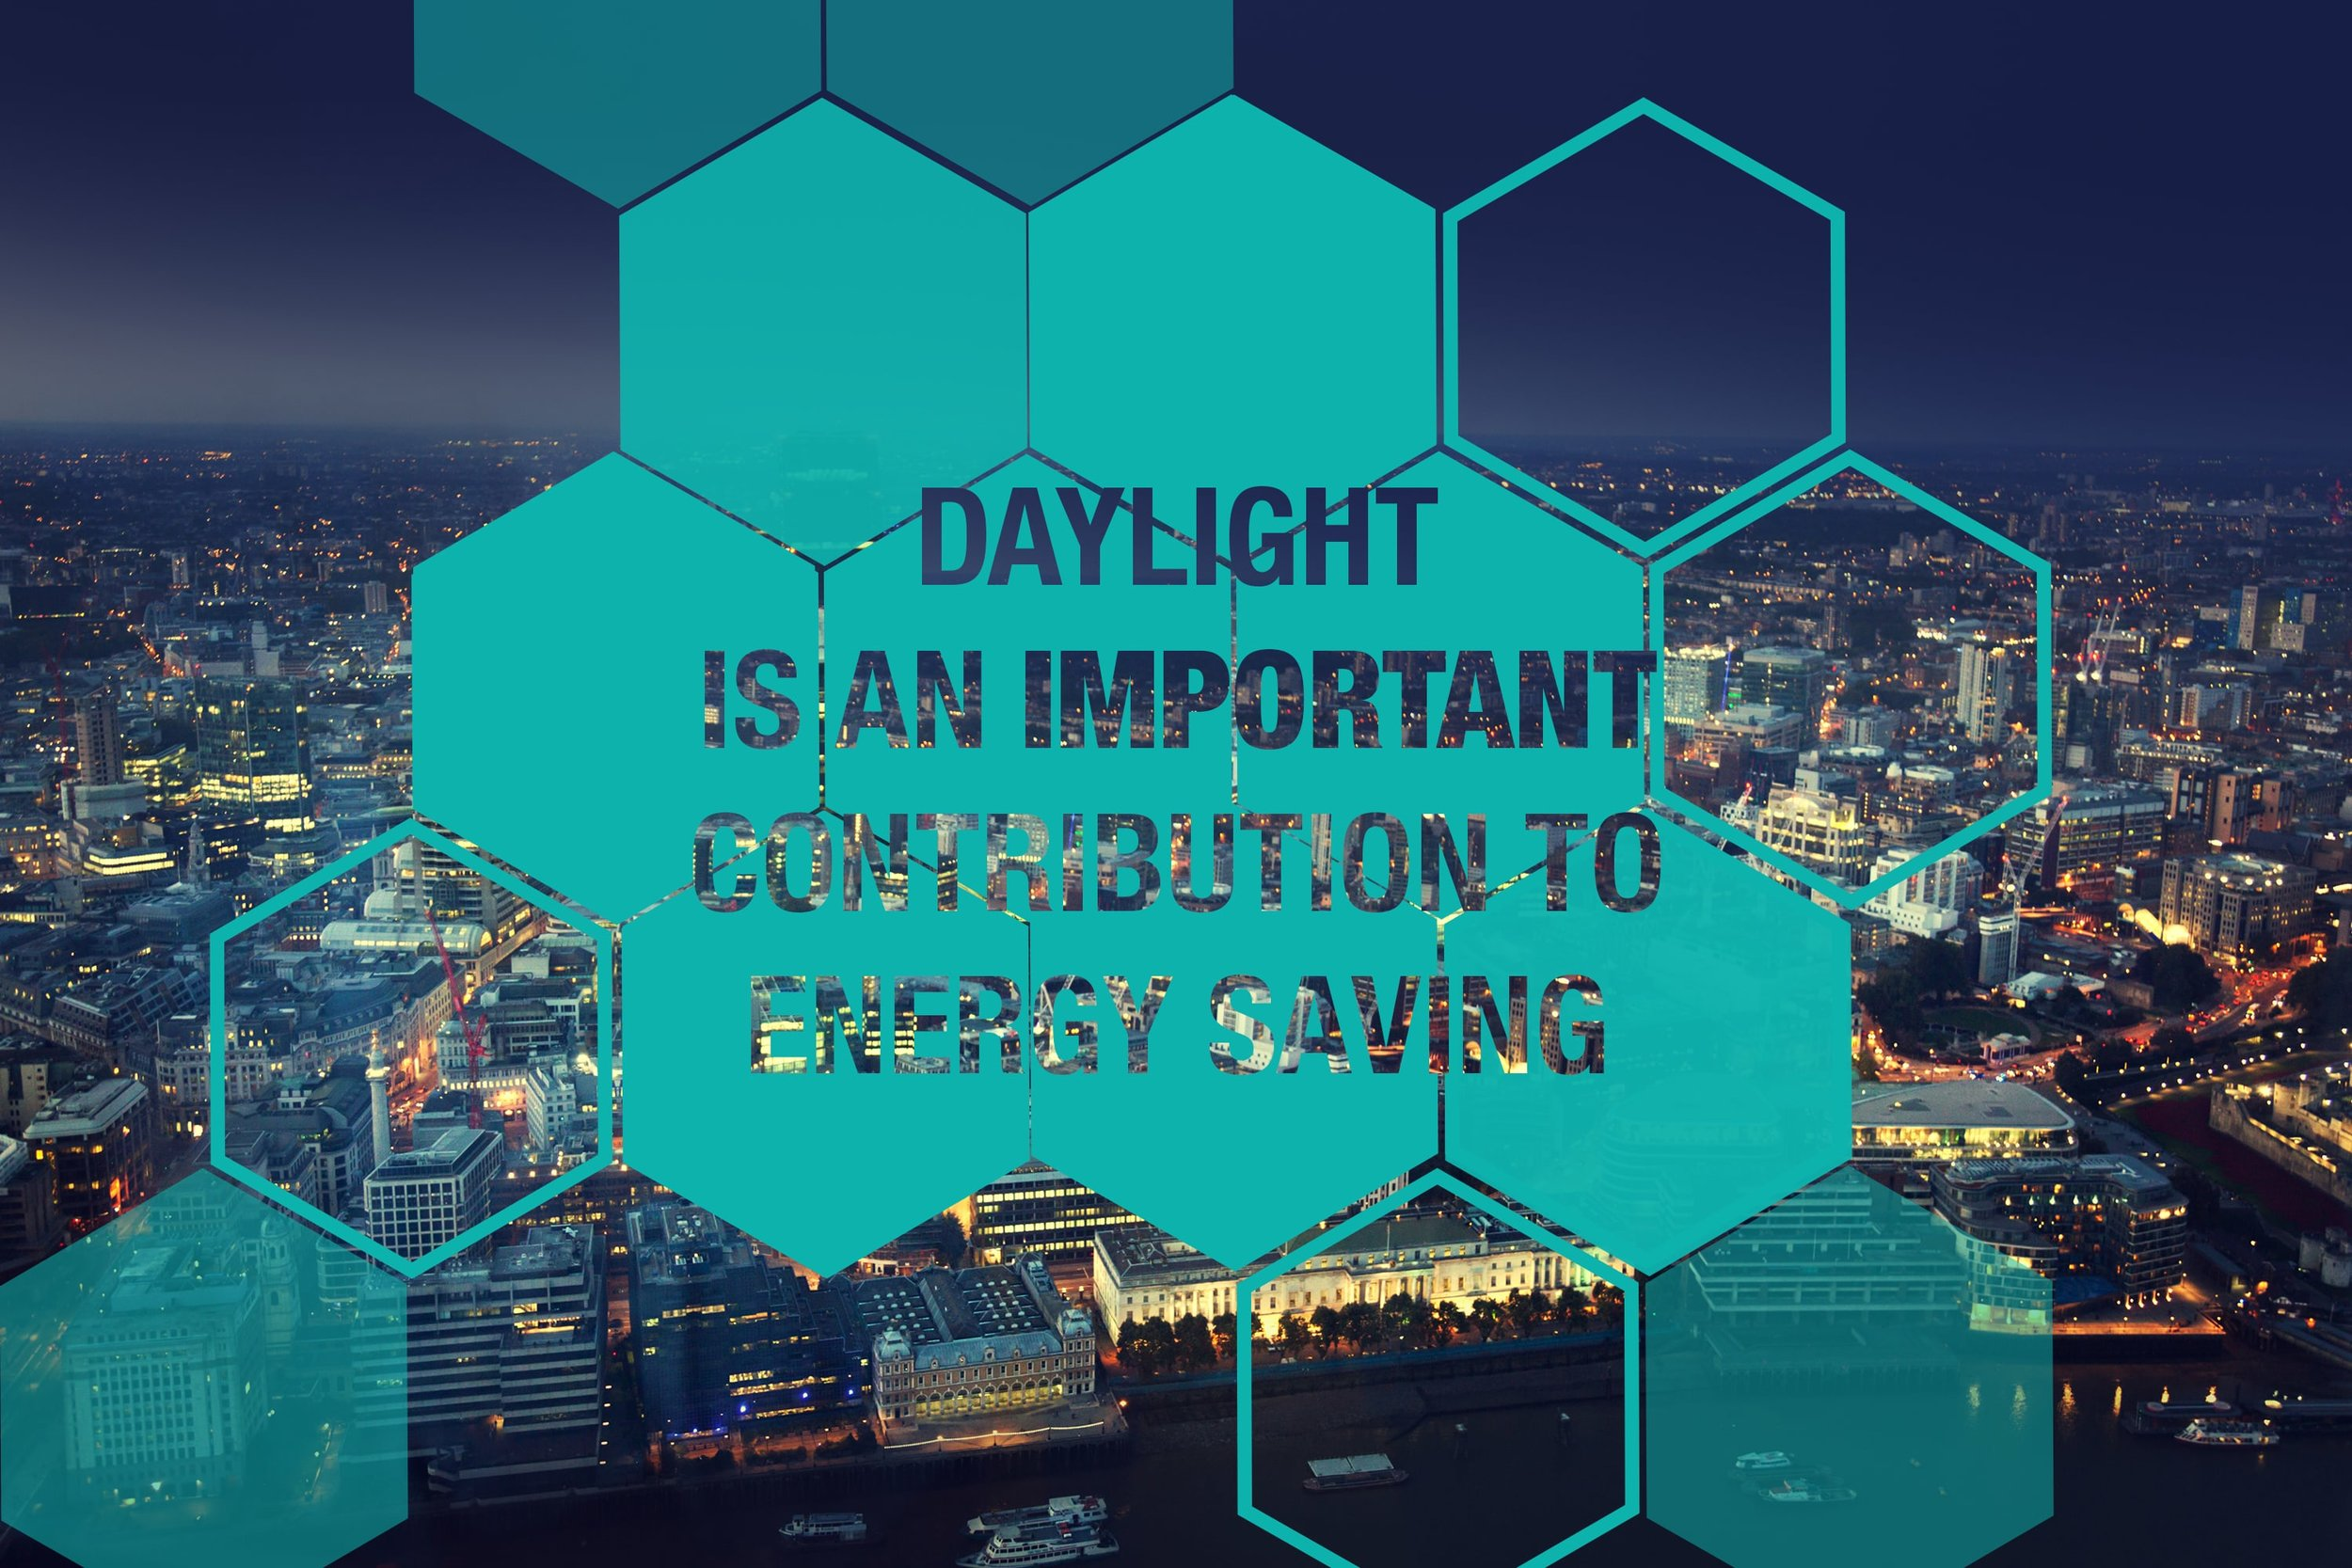 daylight-energy-saving-min.jpg